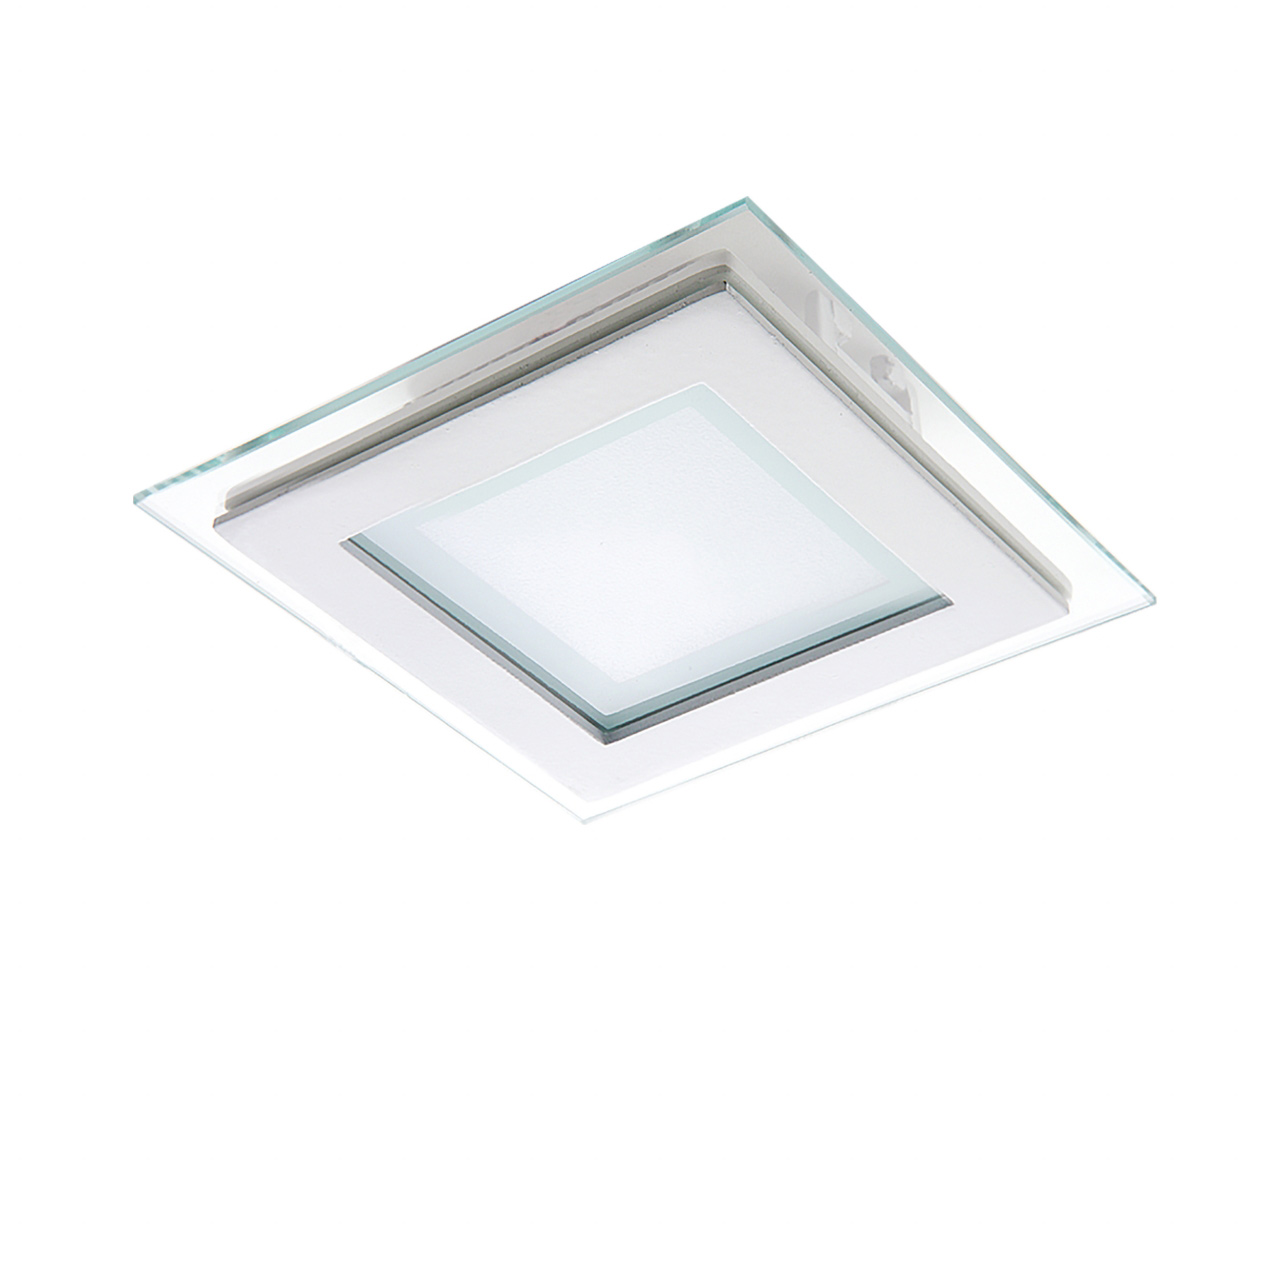 Светильник Acri LED 6W 480LM хром / прозрачный 3000K Lightstar 212020